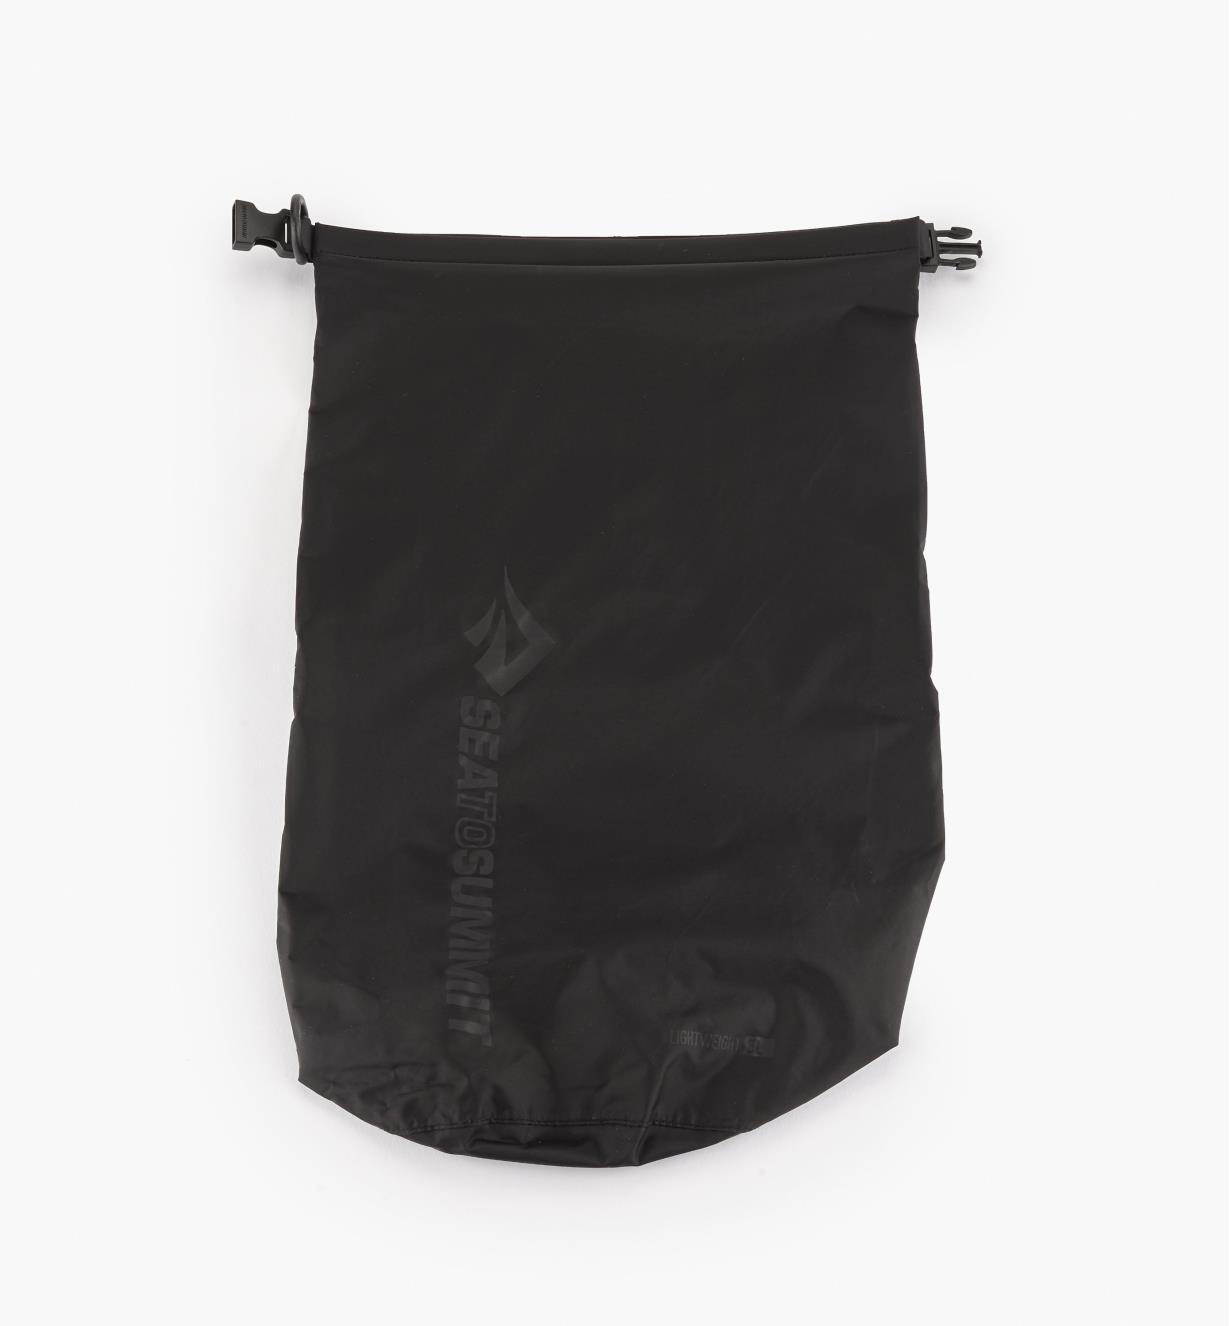 GB363 - 8 litre Dry Sack